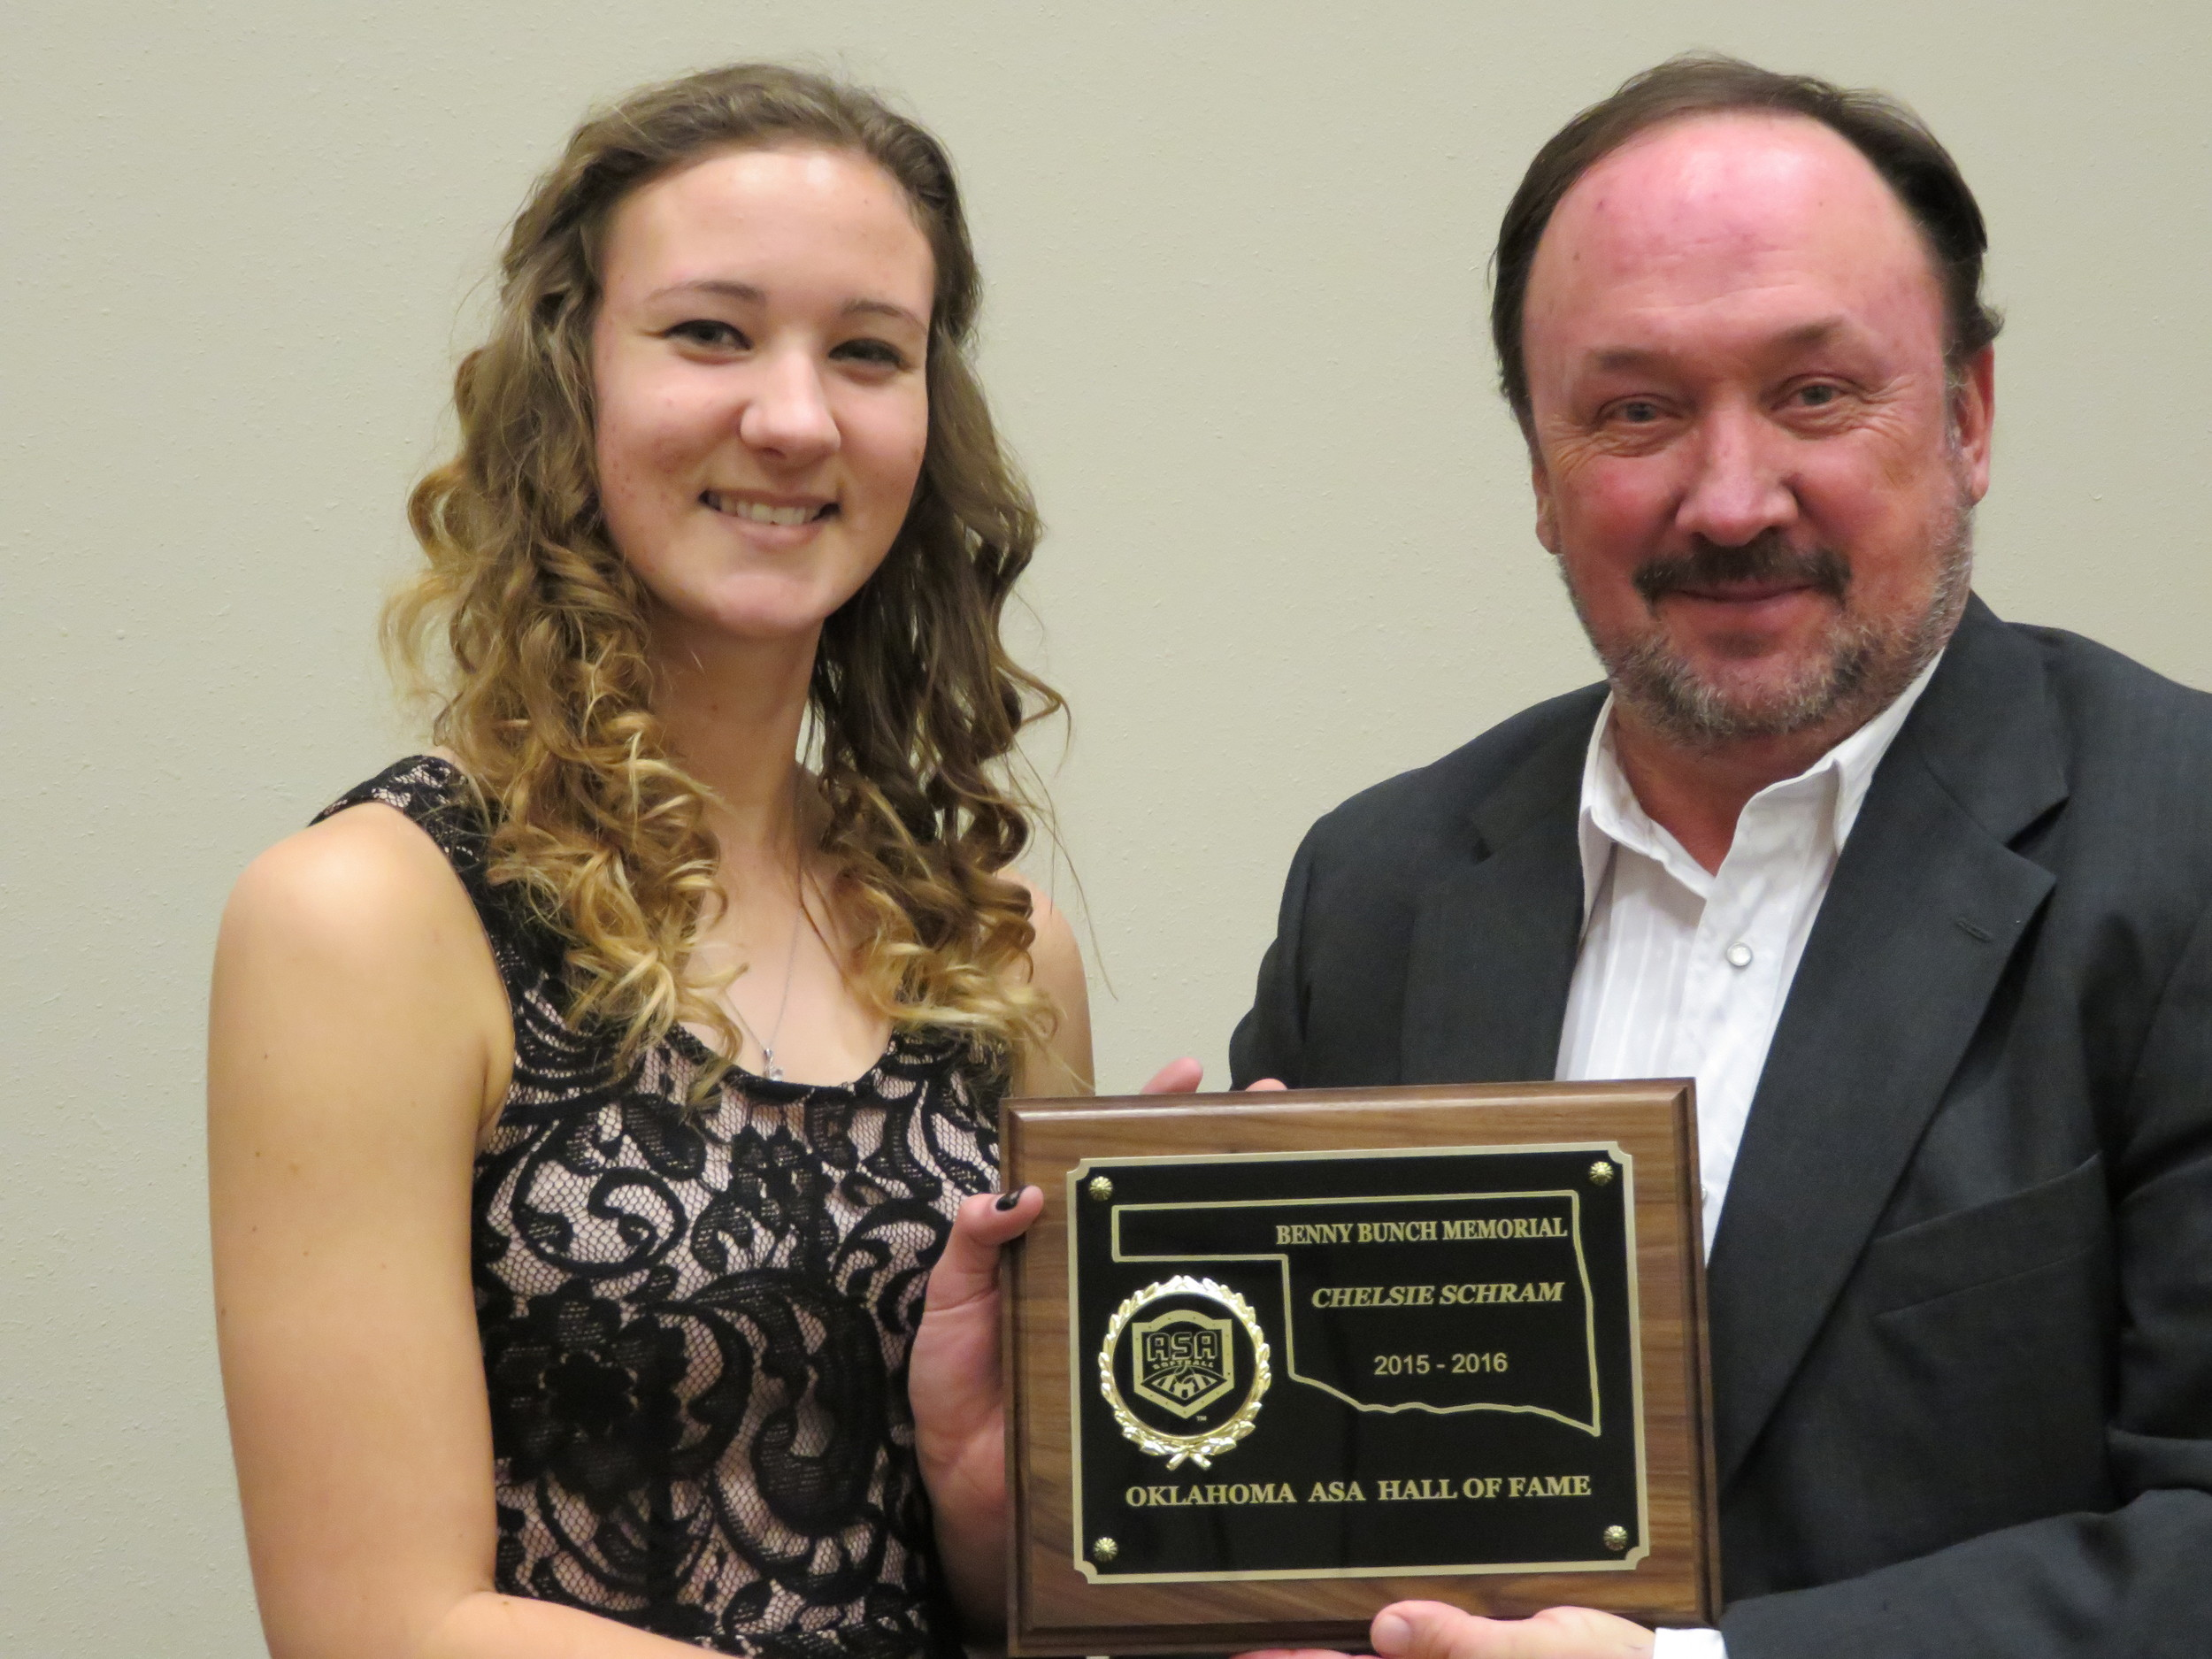 Chelsie Schram Award.JPG